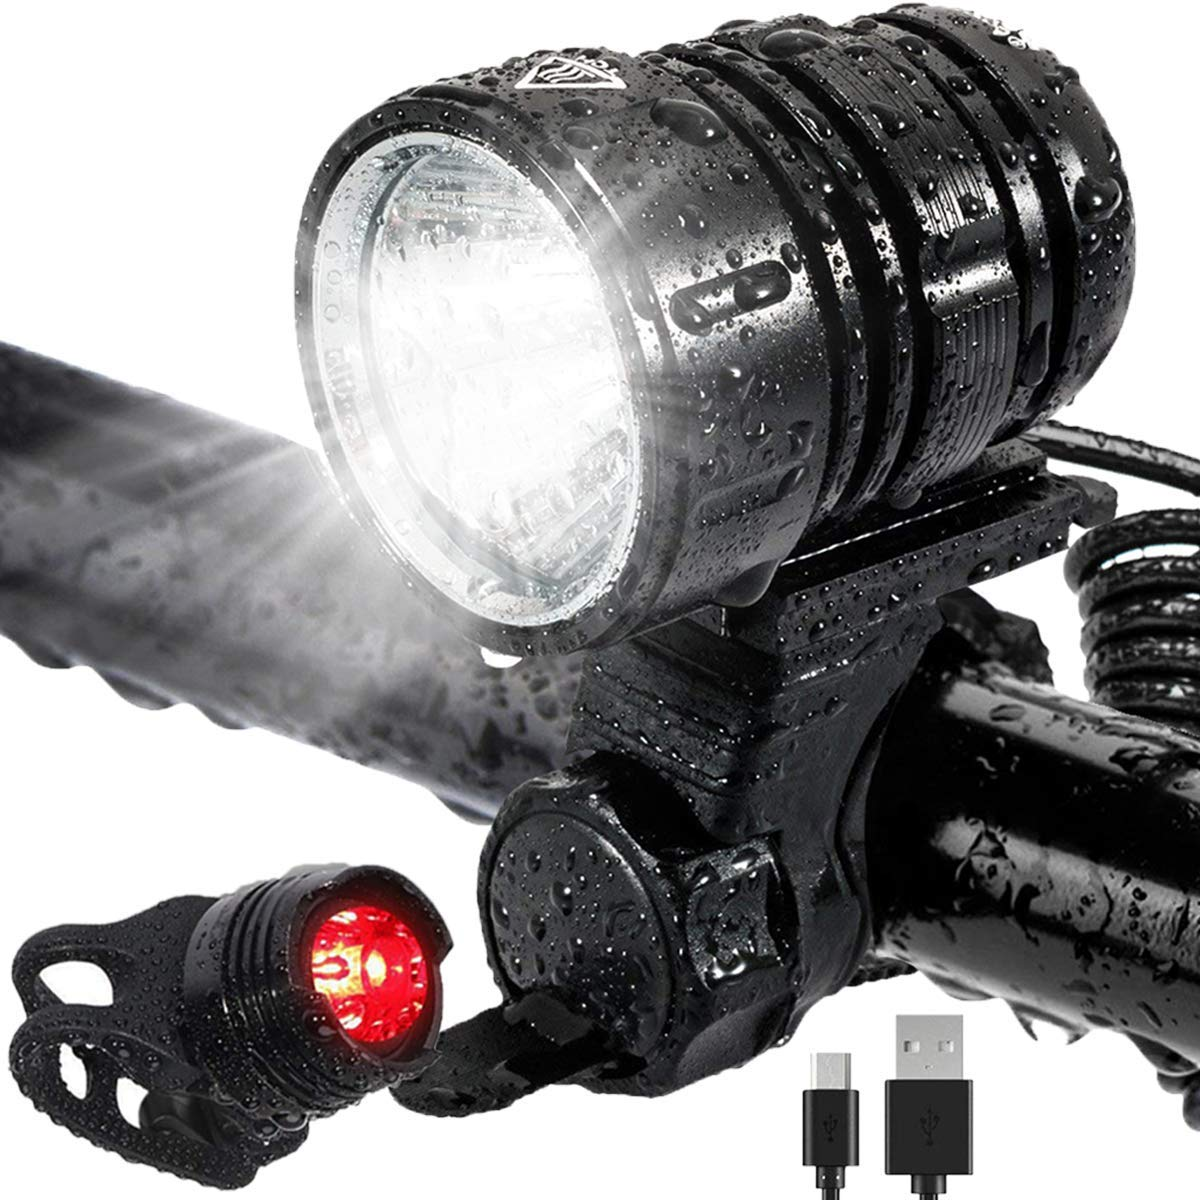 5 Modos Iluminaci/ón Luces Bicicleta LED Luz Bicicleta Impermeable,Luz de Bici Recargable USB Al Aire Libre Luces Bici Delantera and LED Luces Trasera Kit,1200 L/úmenes S/úper Potente L/ámpara